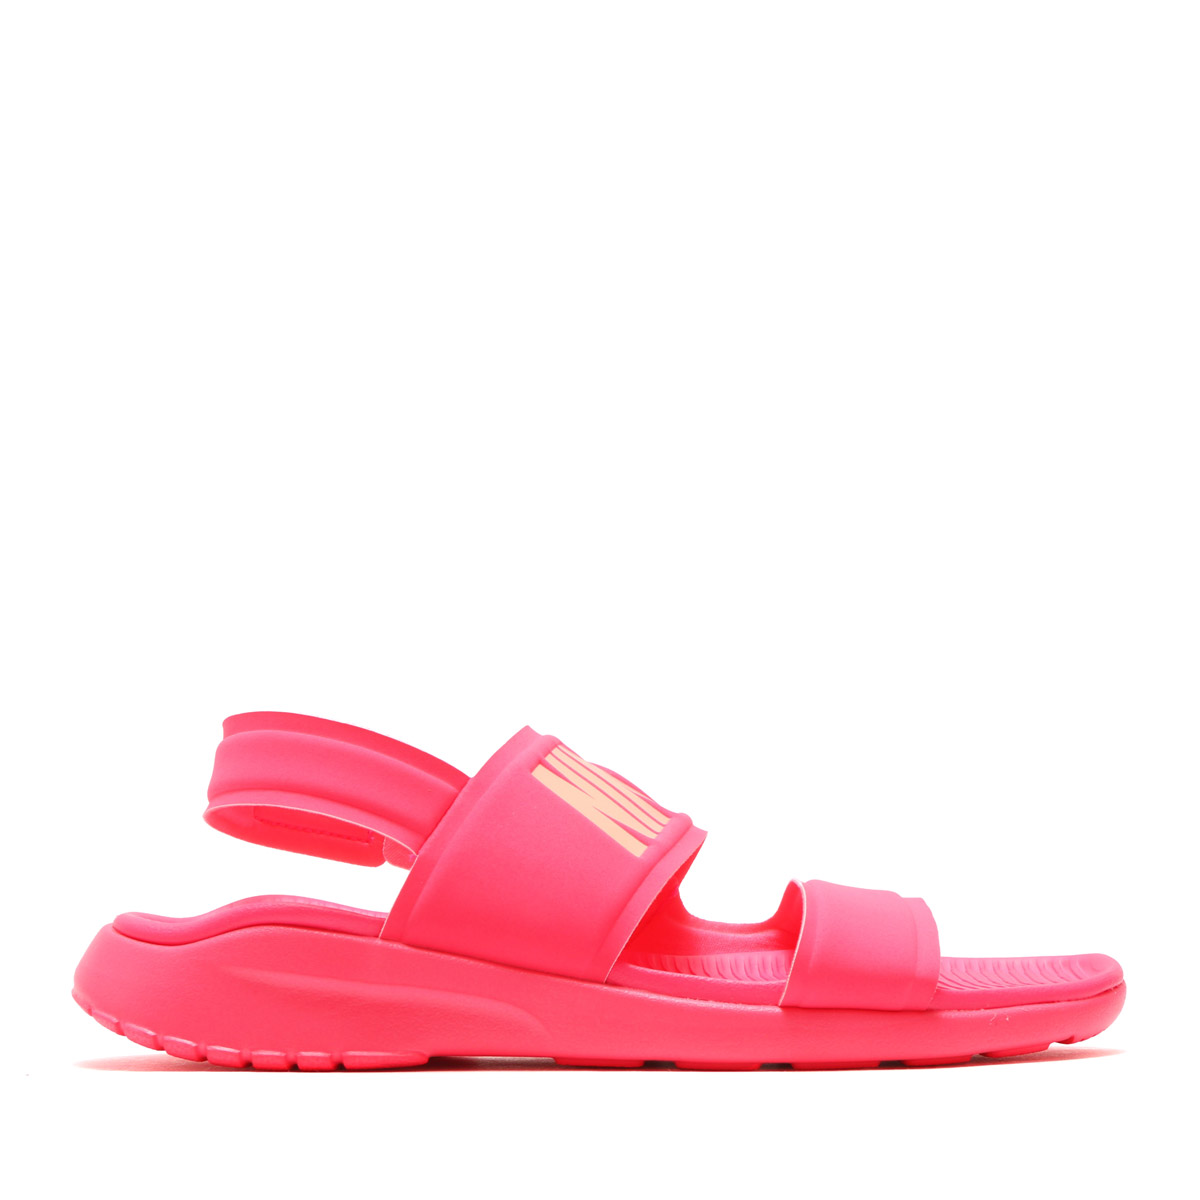 8fa2f00f7f29 NIKE WMNS TANJUN SANDAL (Nike women tongue Jun sandals) RACER PINK SUNSET  GLOW 17SU-I